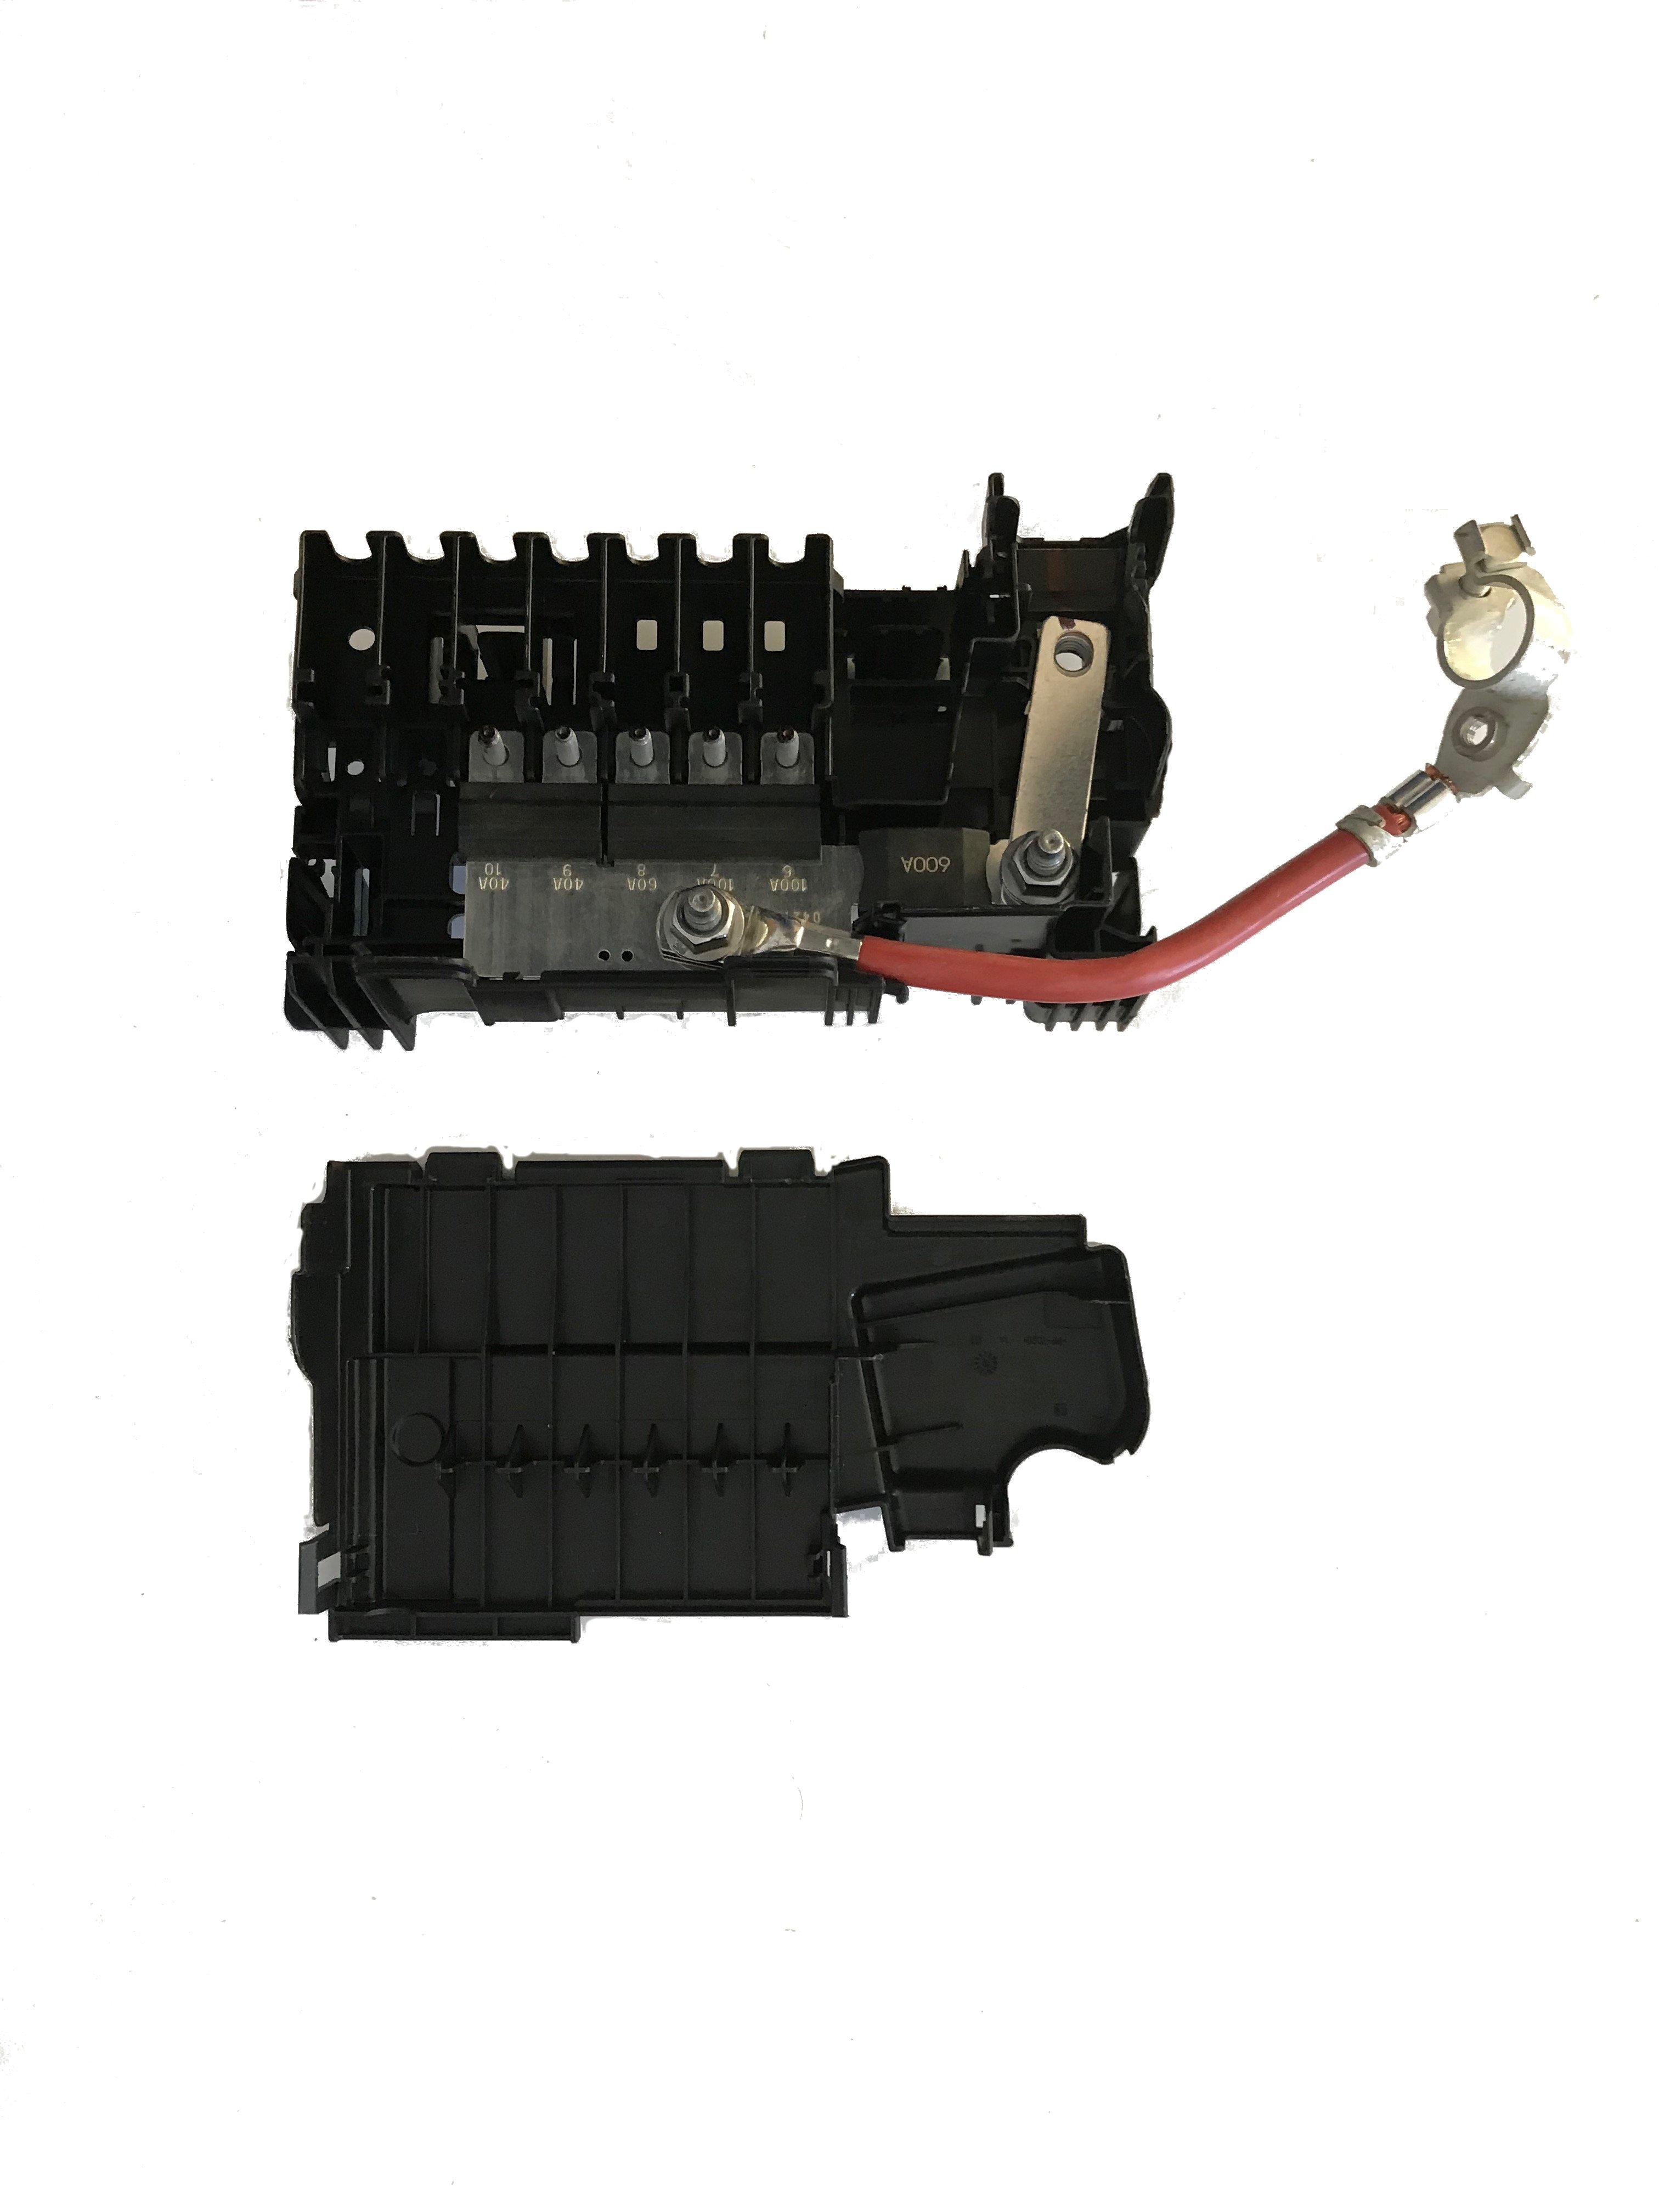 oem 2016 2017 chevrolet cruze electrical fuse box p n 39023242 [ 3024 x 4032 Pixel ]